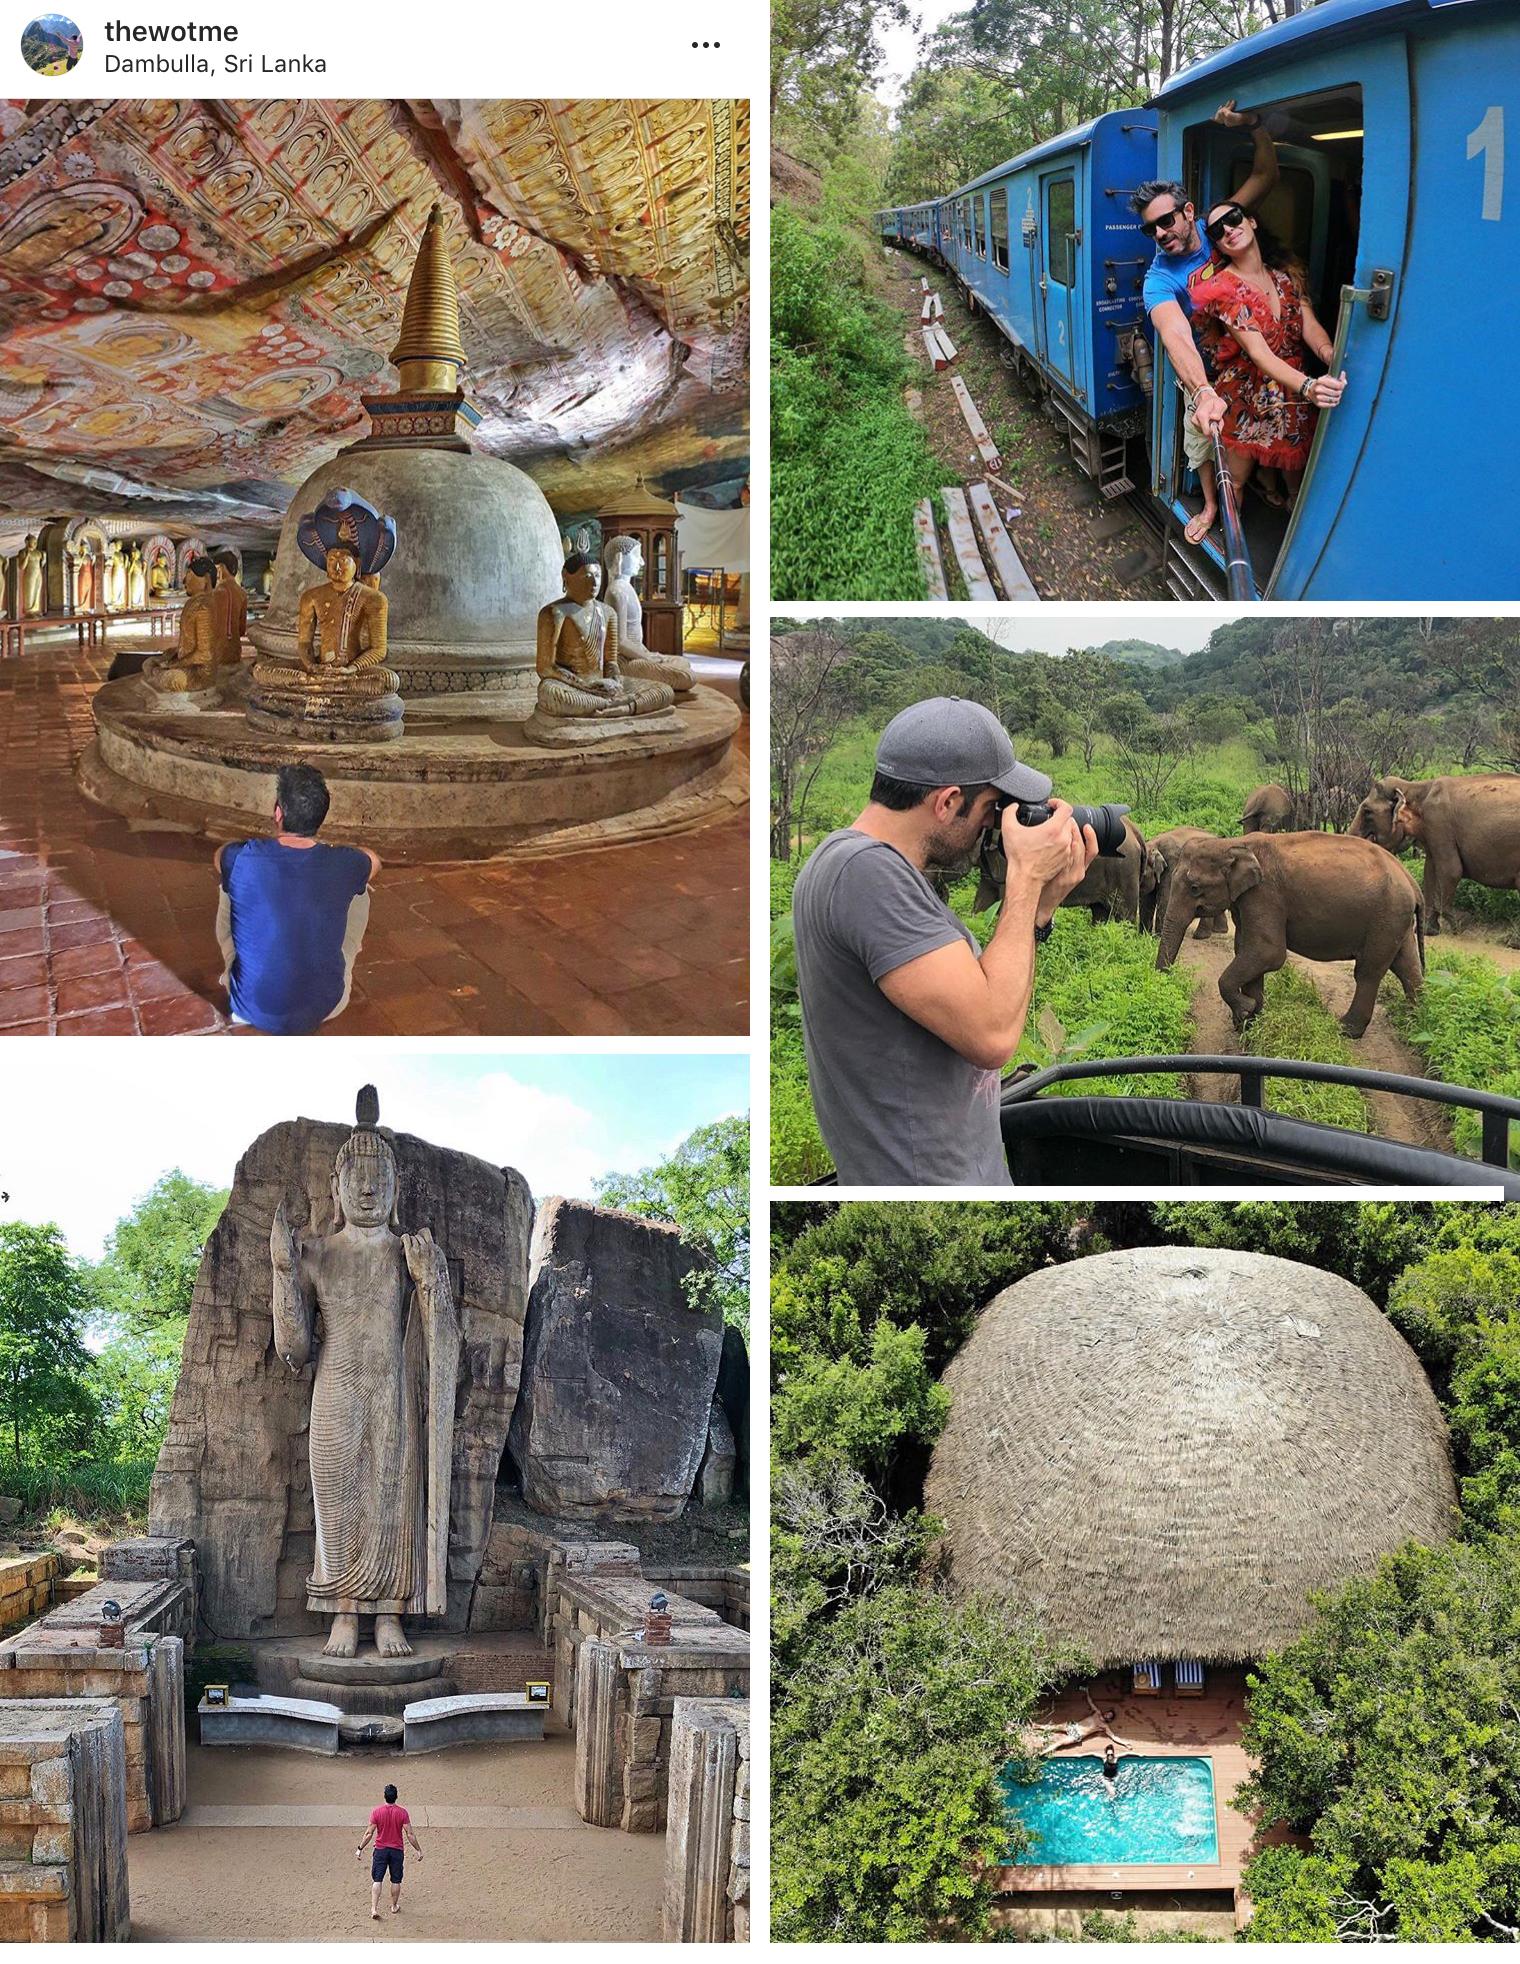 Memoria de viajes 2018 Viajes a Sri Lanka  - 44699301500 e2745a5e3b o - Memoria de Viajes 2018: El año de los Maratones